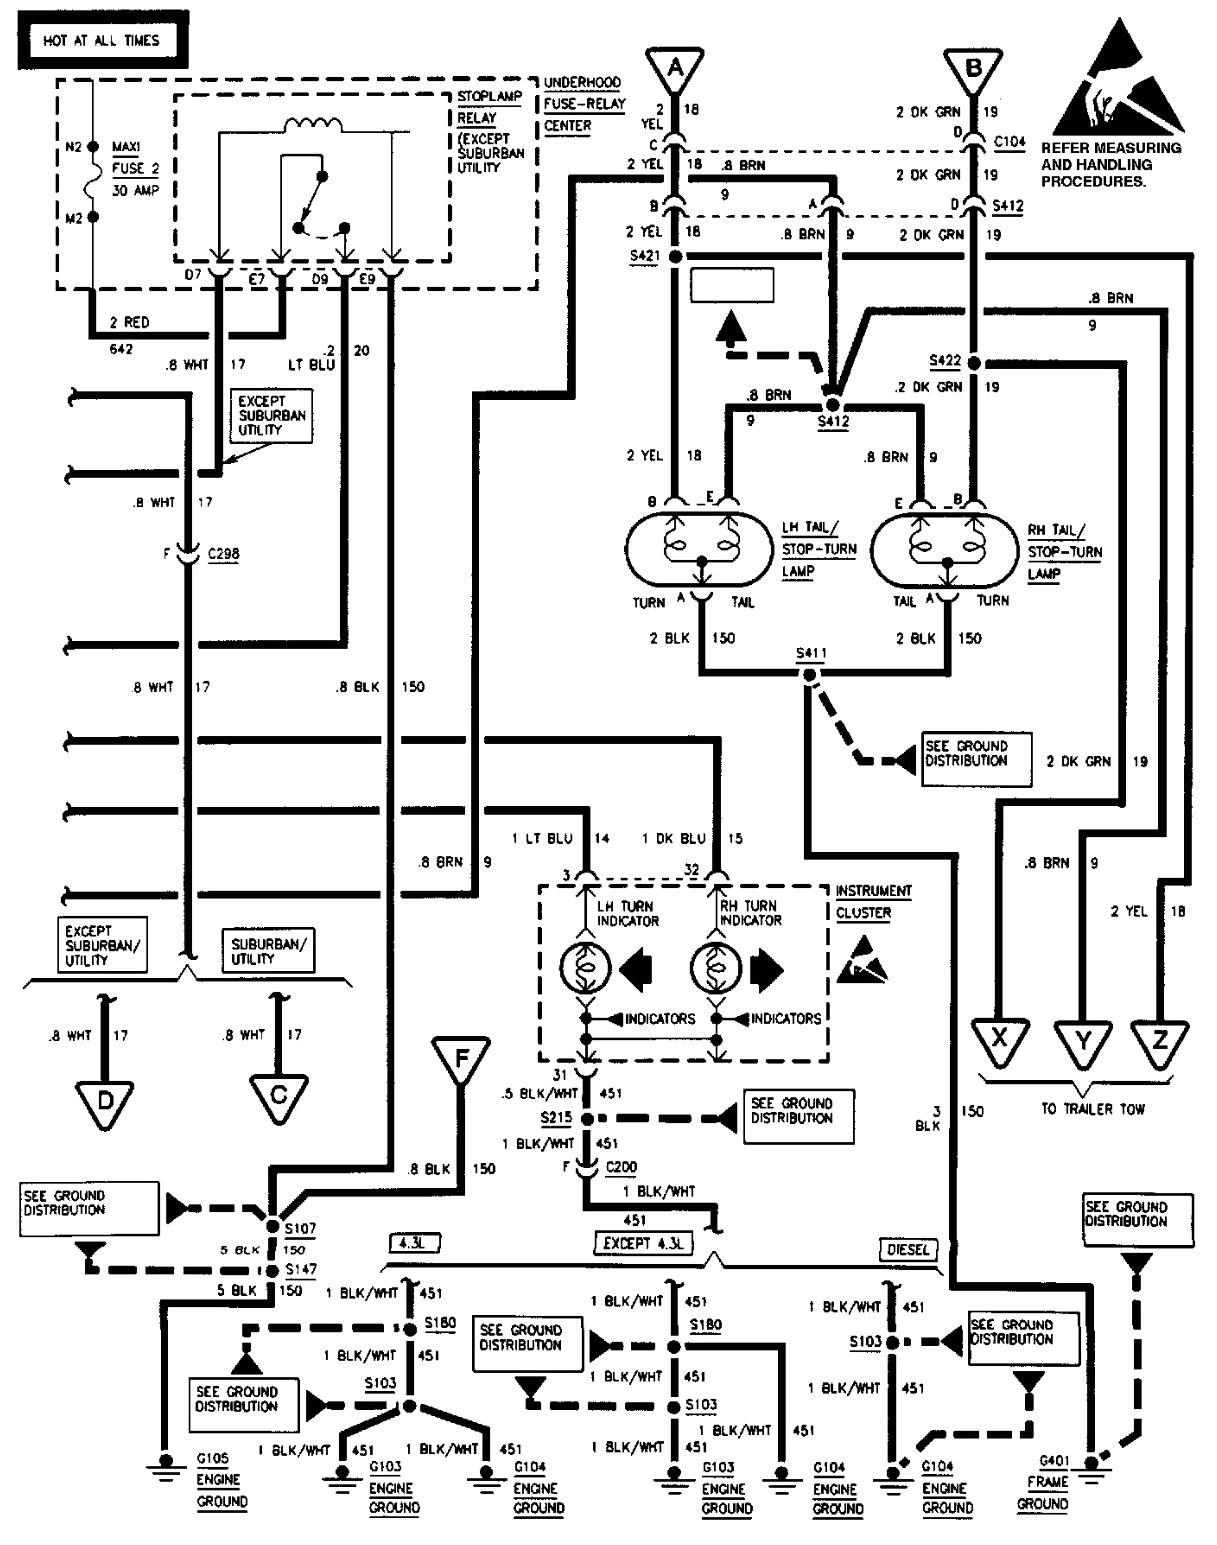 YC_8099] Chevy 1500 Wiring Diagram Wiring Diagram For 1997 Chevy Silverado  Free DiagramBemua Kapemie Mohammedshrine Librar Wiring 101